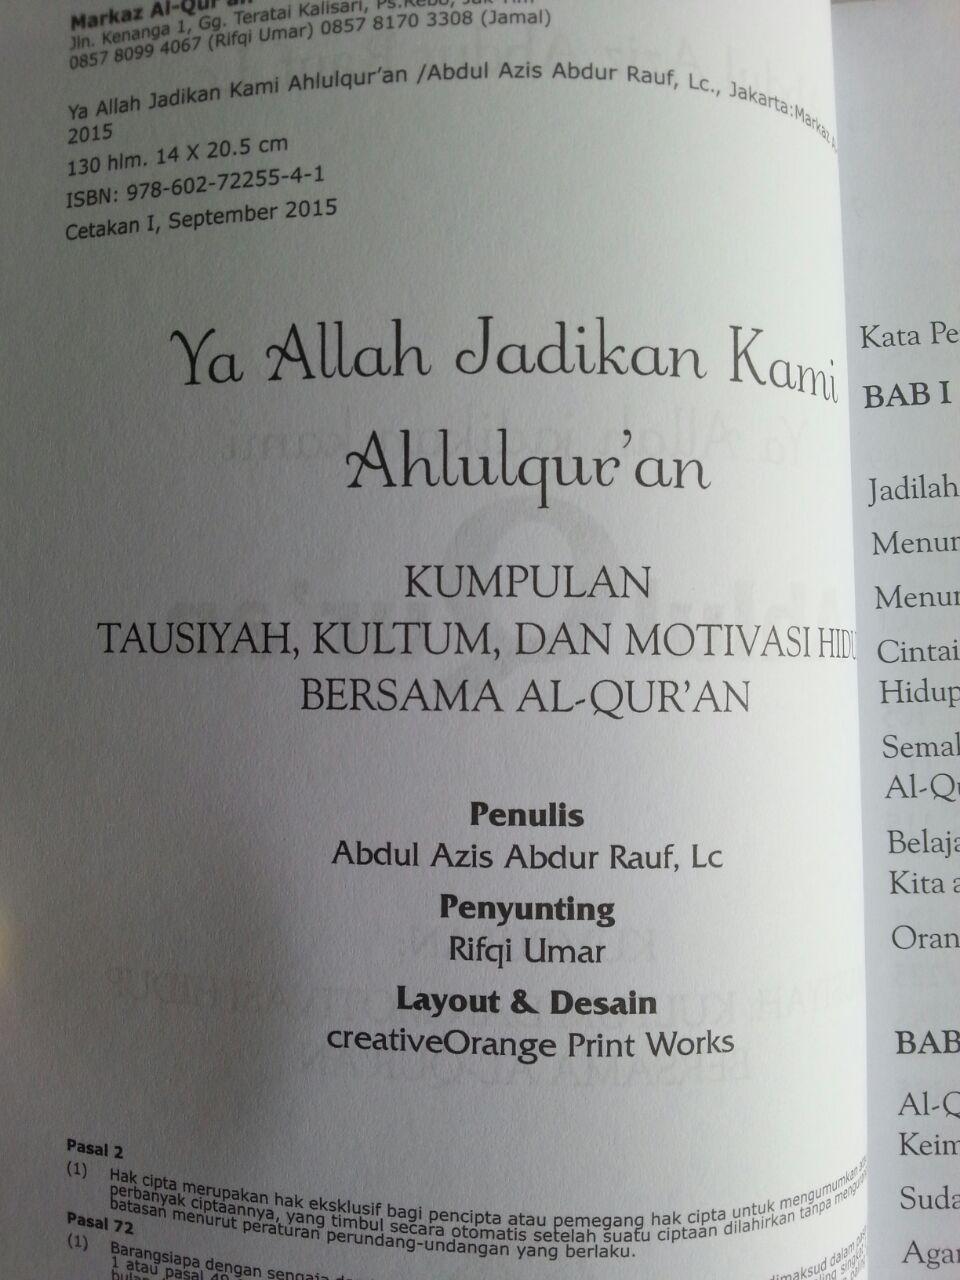 Buku Ya Allah Jadikan Kami Ahlul Quran Kumpulan Motivasi 1 isi